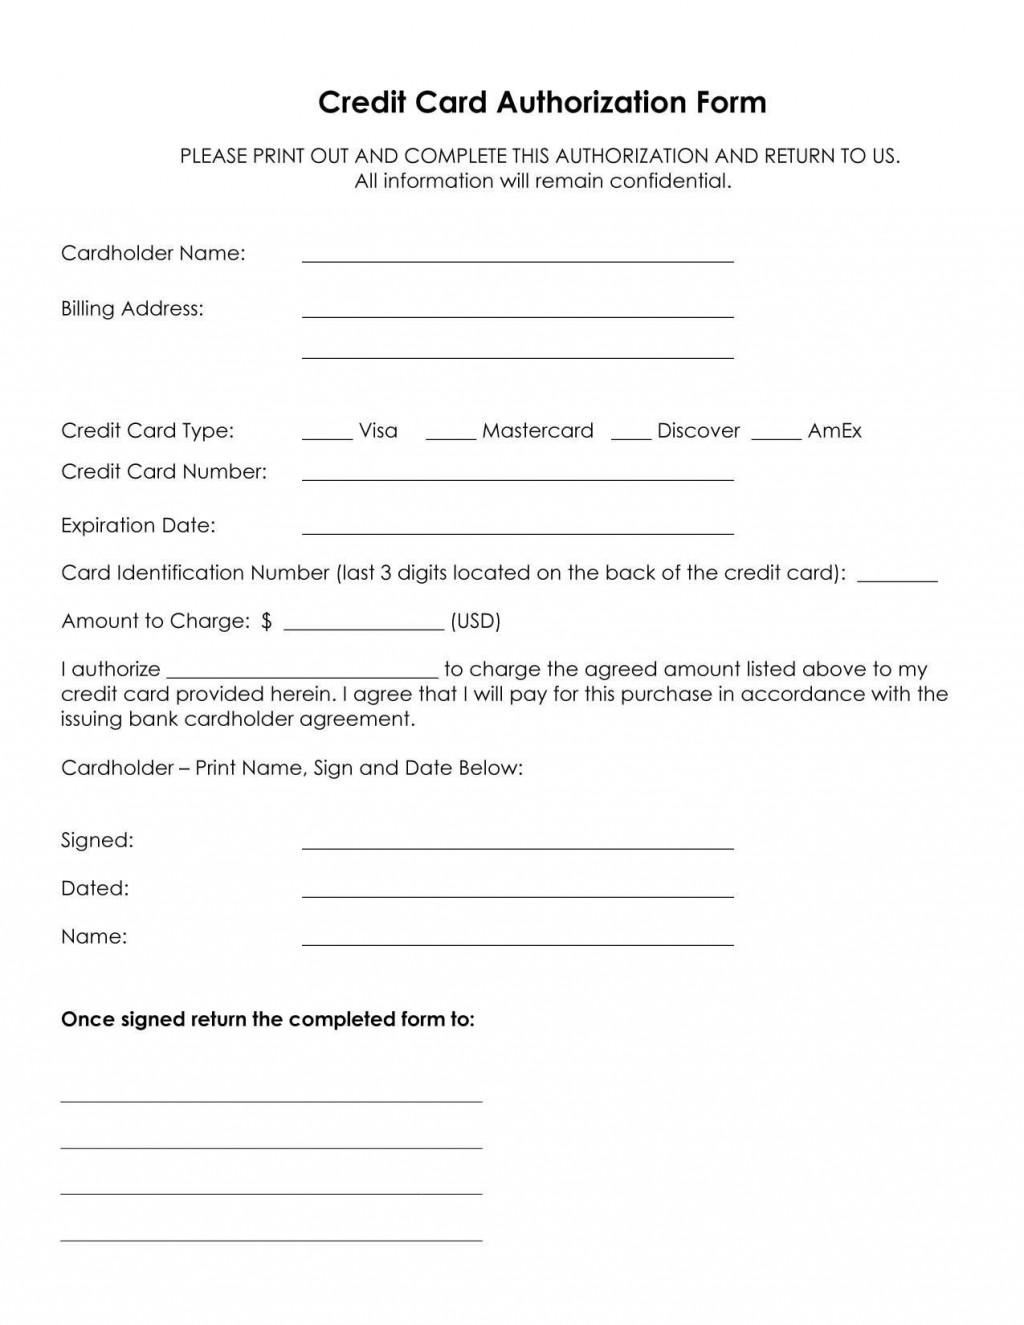 001 Shocking Credit Card Form Template Image  Html Example Codepen Authorization FreeLarge